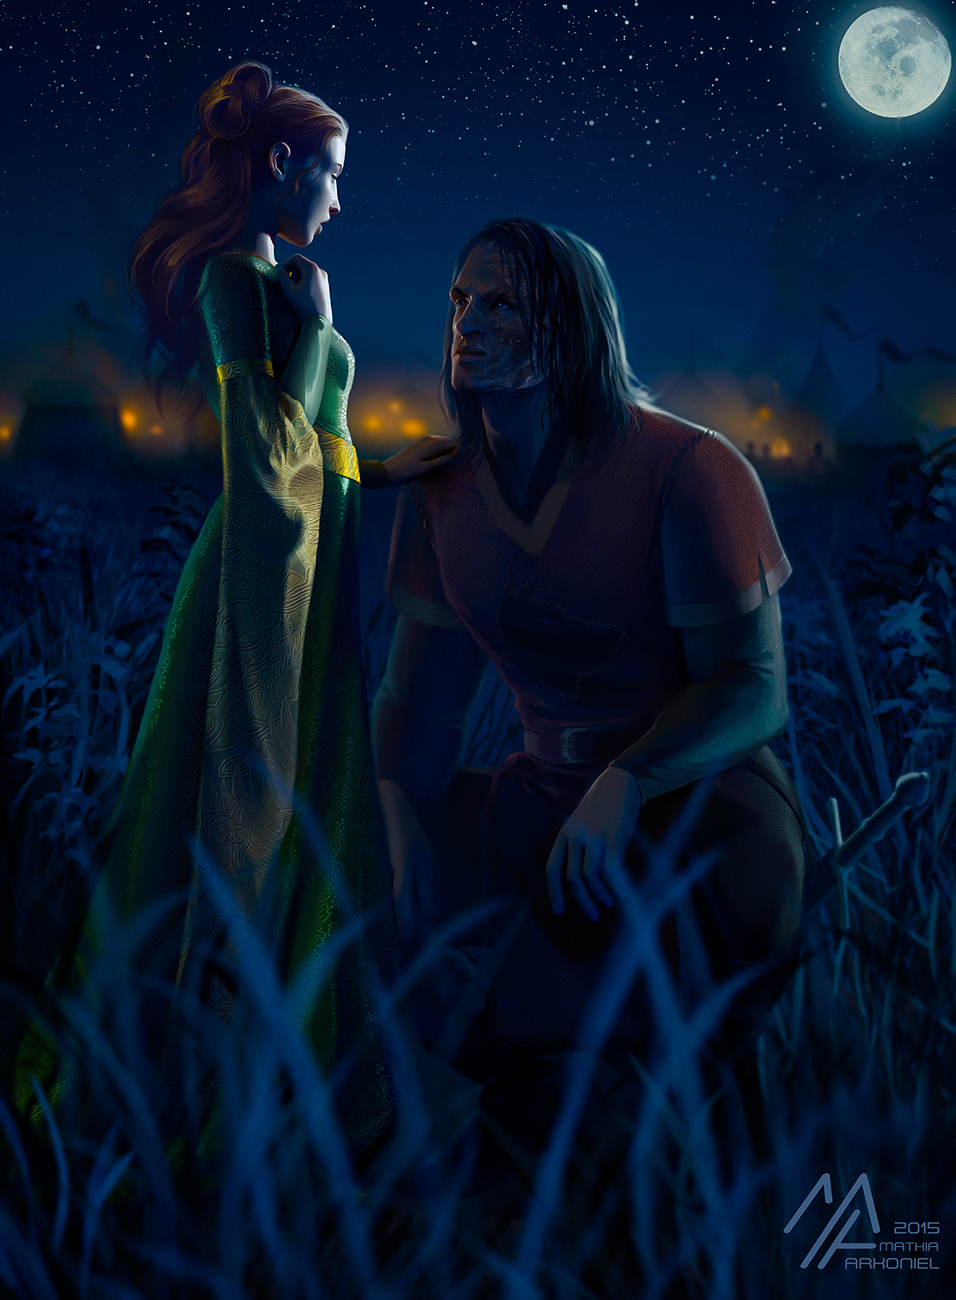 asoiaf: Sansa and Sandor by MathiaArkoniel on DeviantArt